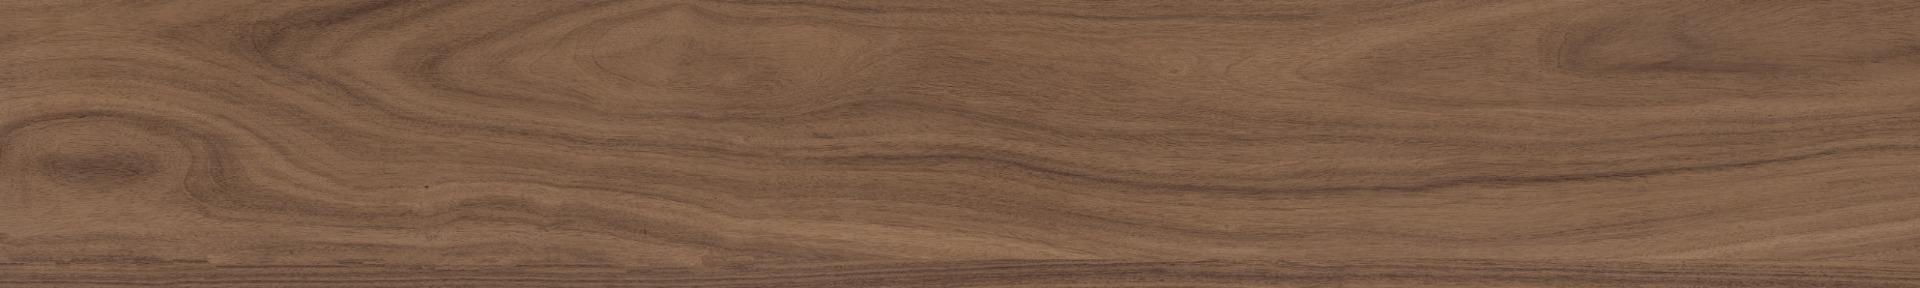 DGVT Pacific Pine Wood Brown